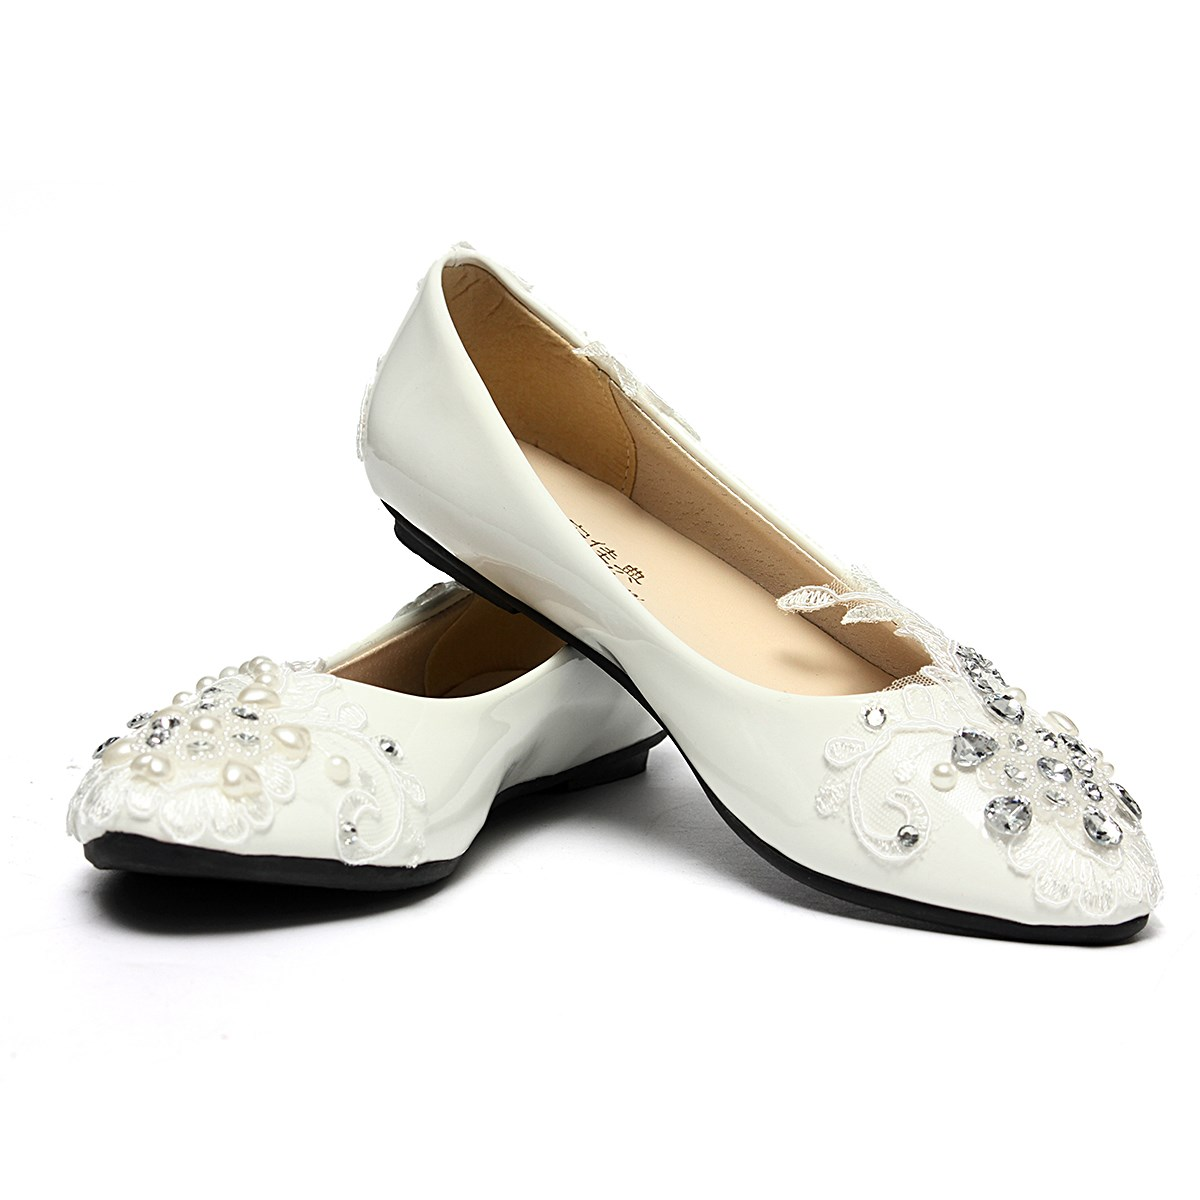 Bridal Loafers Party Dress Handmade New Women Wedding Shoes Rhinestone Slip On Flat Heel Flower Lace Crystal Ladies Flats<br><br>Aliexpress